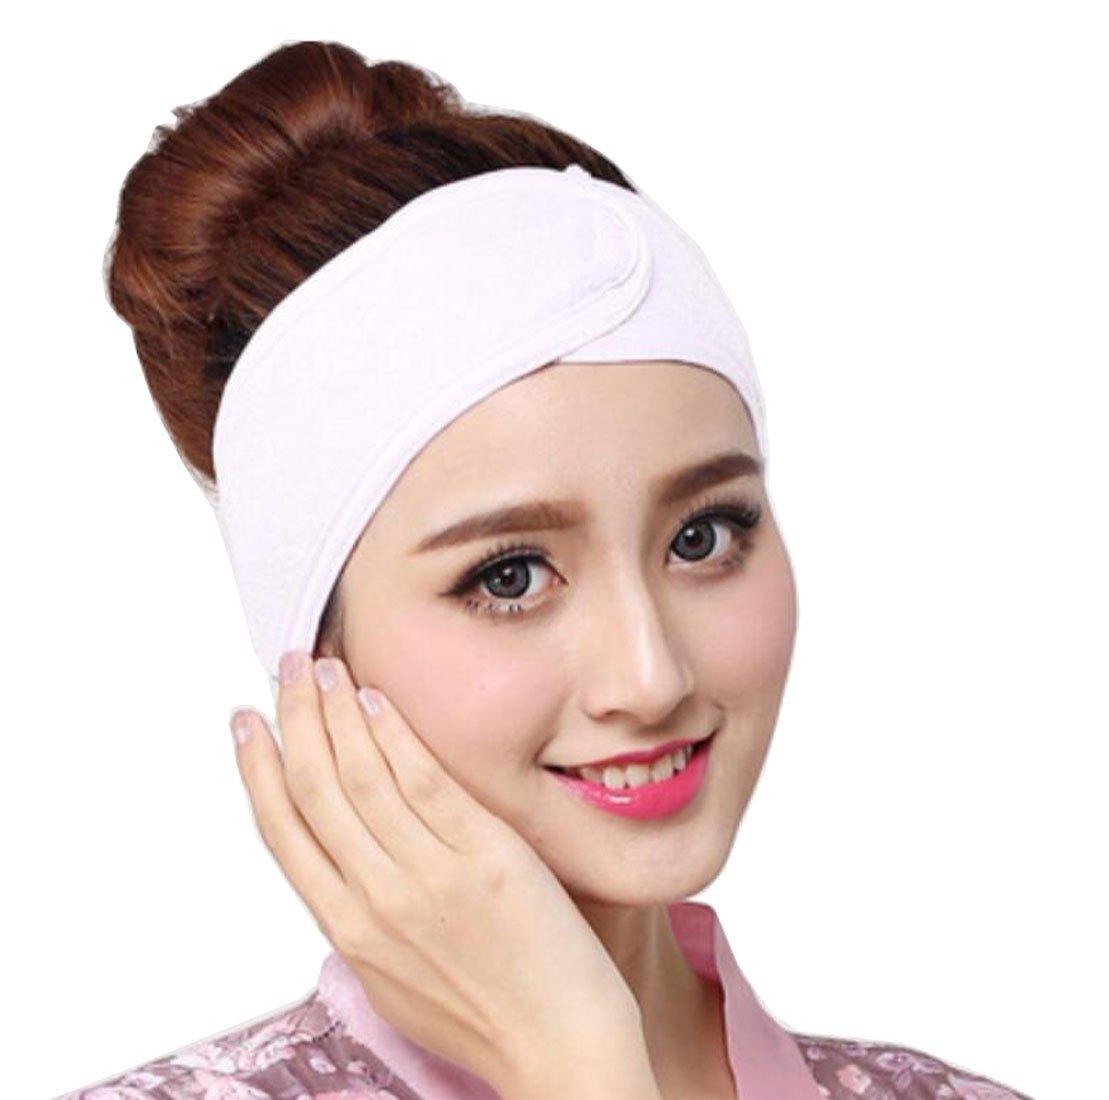 Amazon.com: 3Pcs 3.5 Inch Wide Stretch Terry Cloth Headband ...